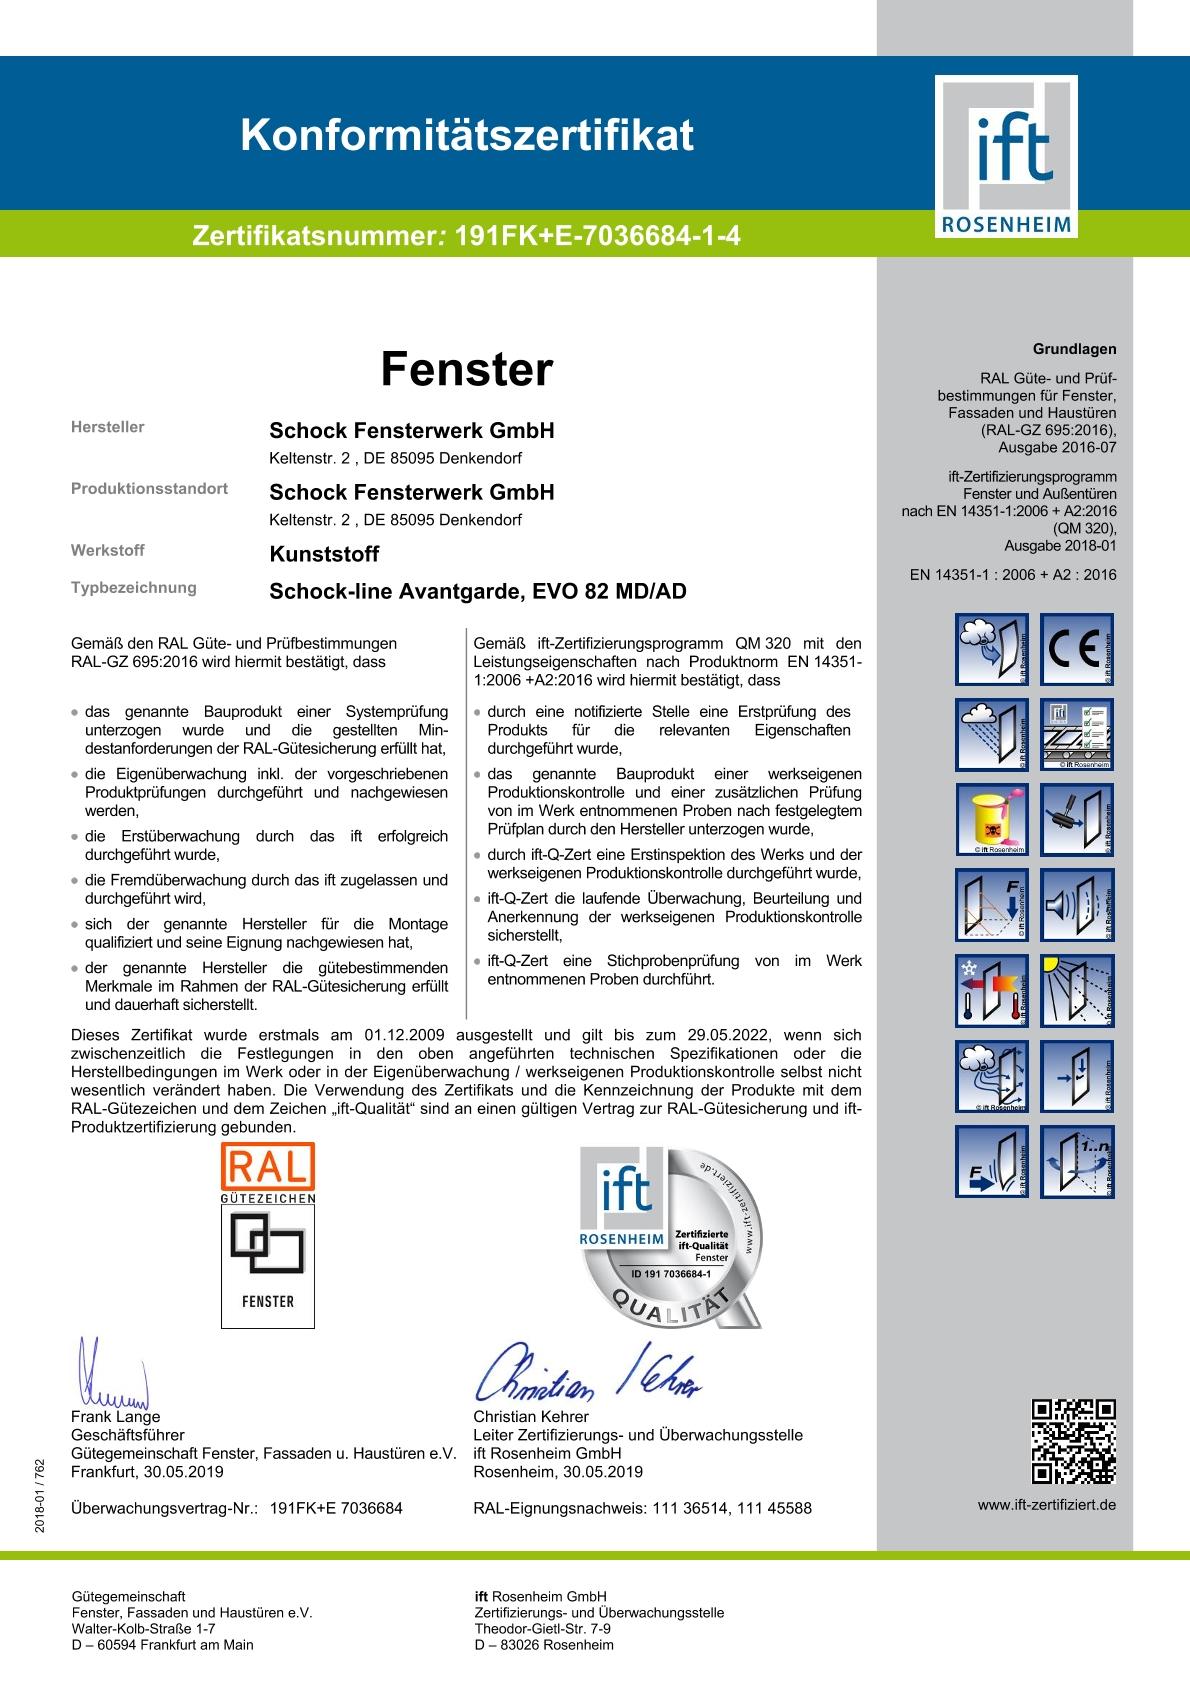 IFT Zertifikat 2019